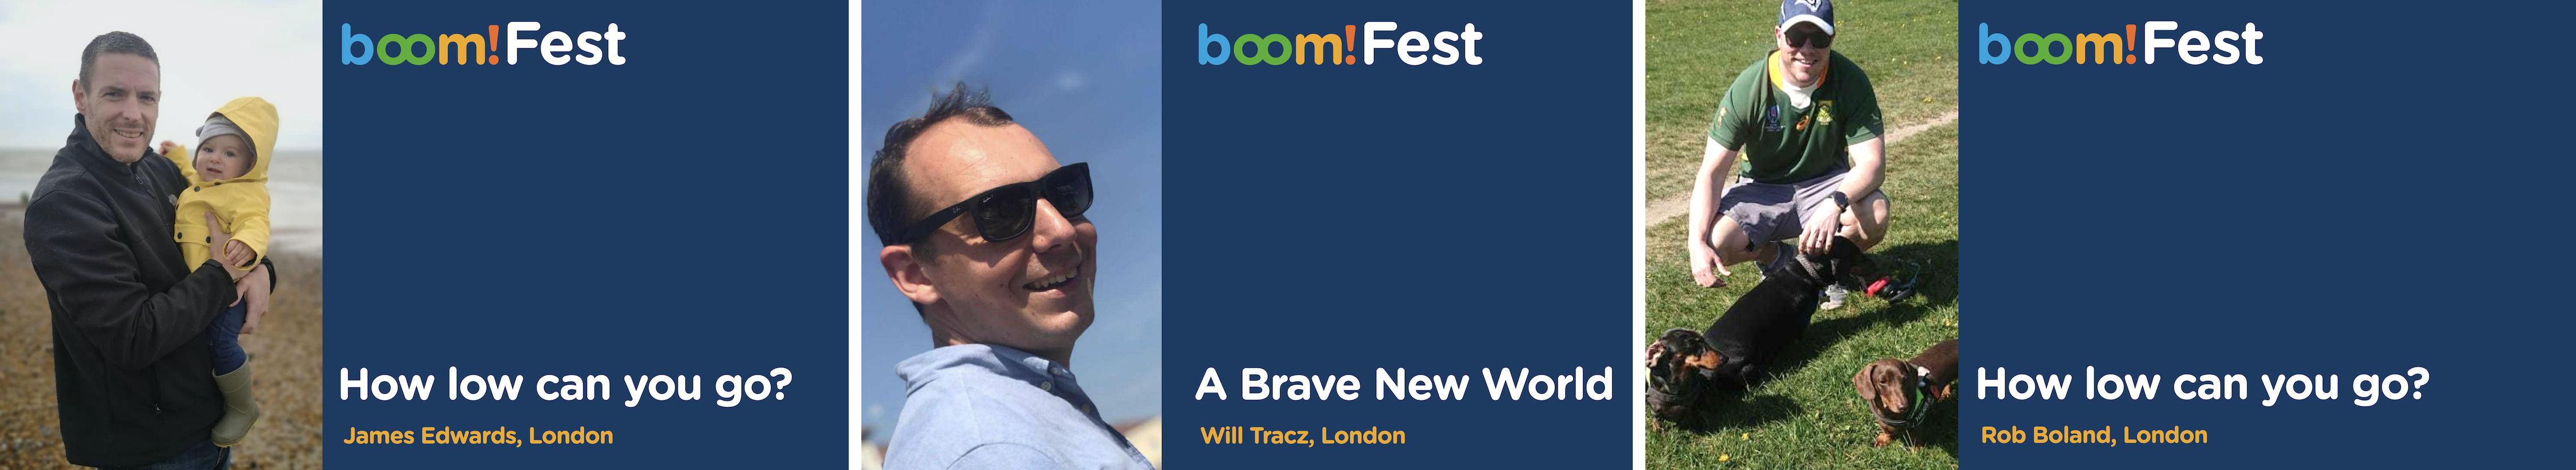 boomfest-presenters-slides-2